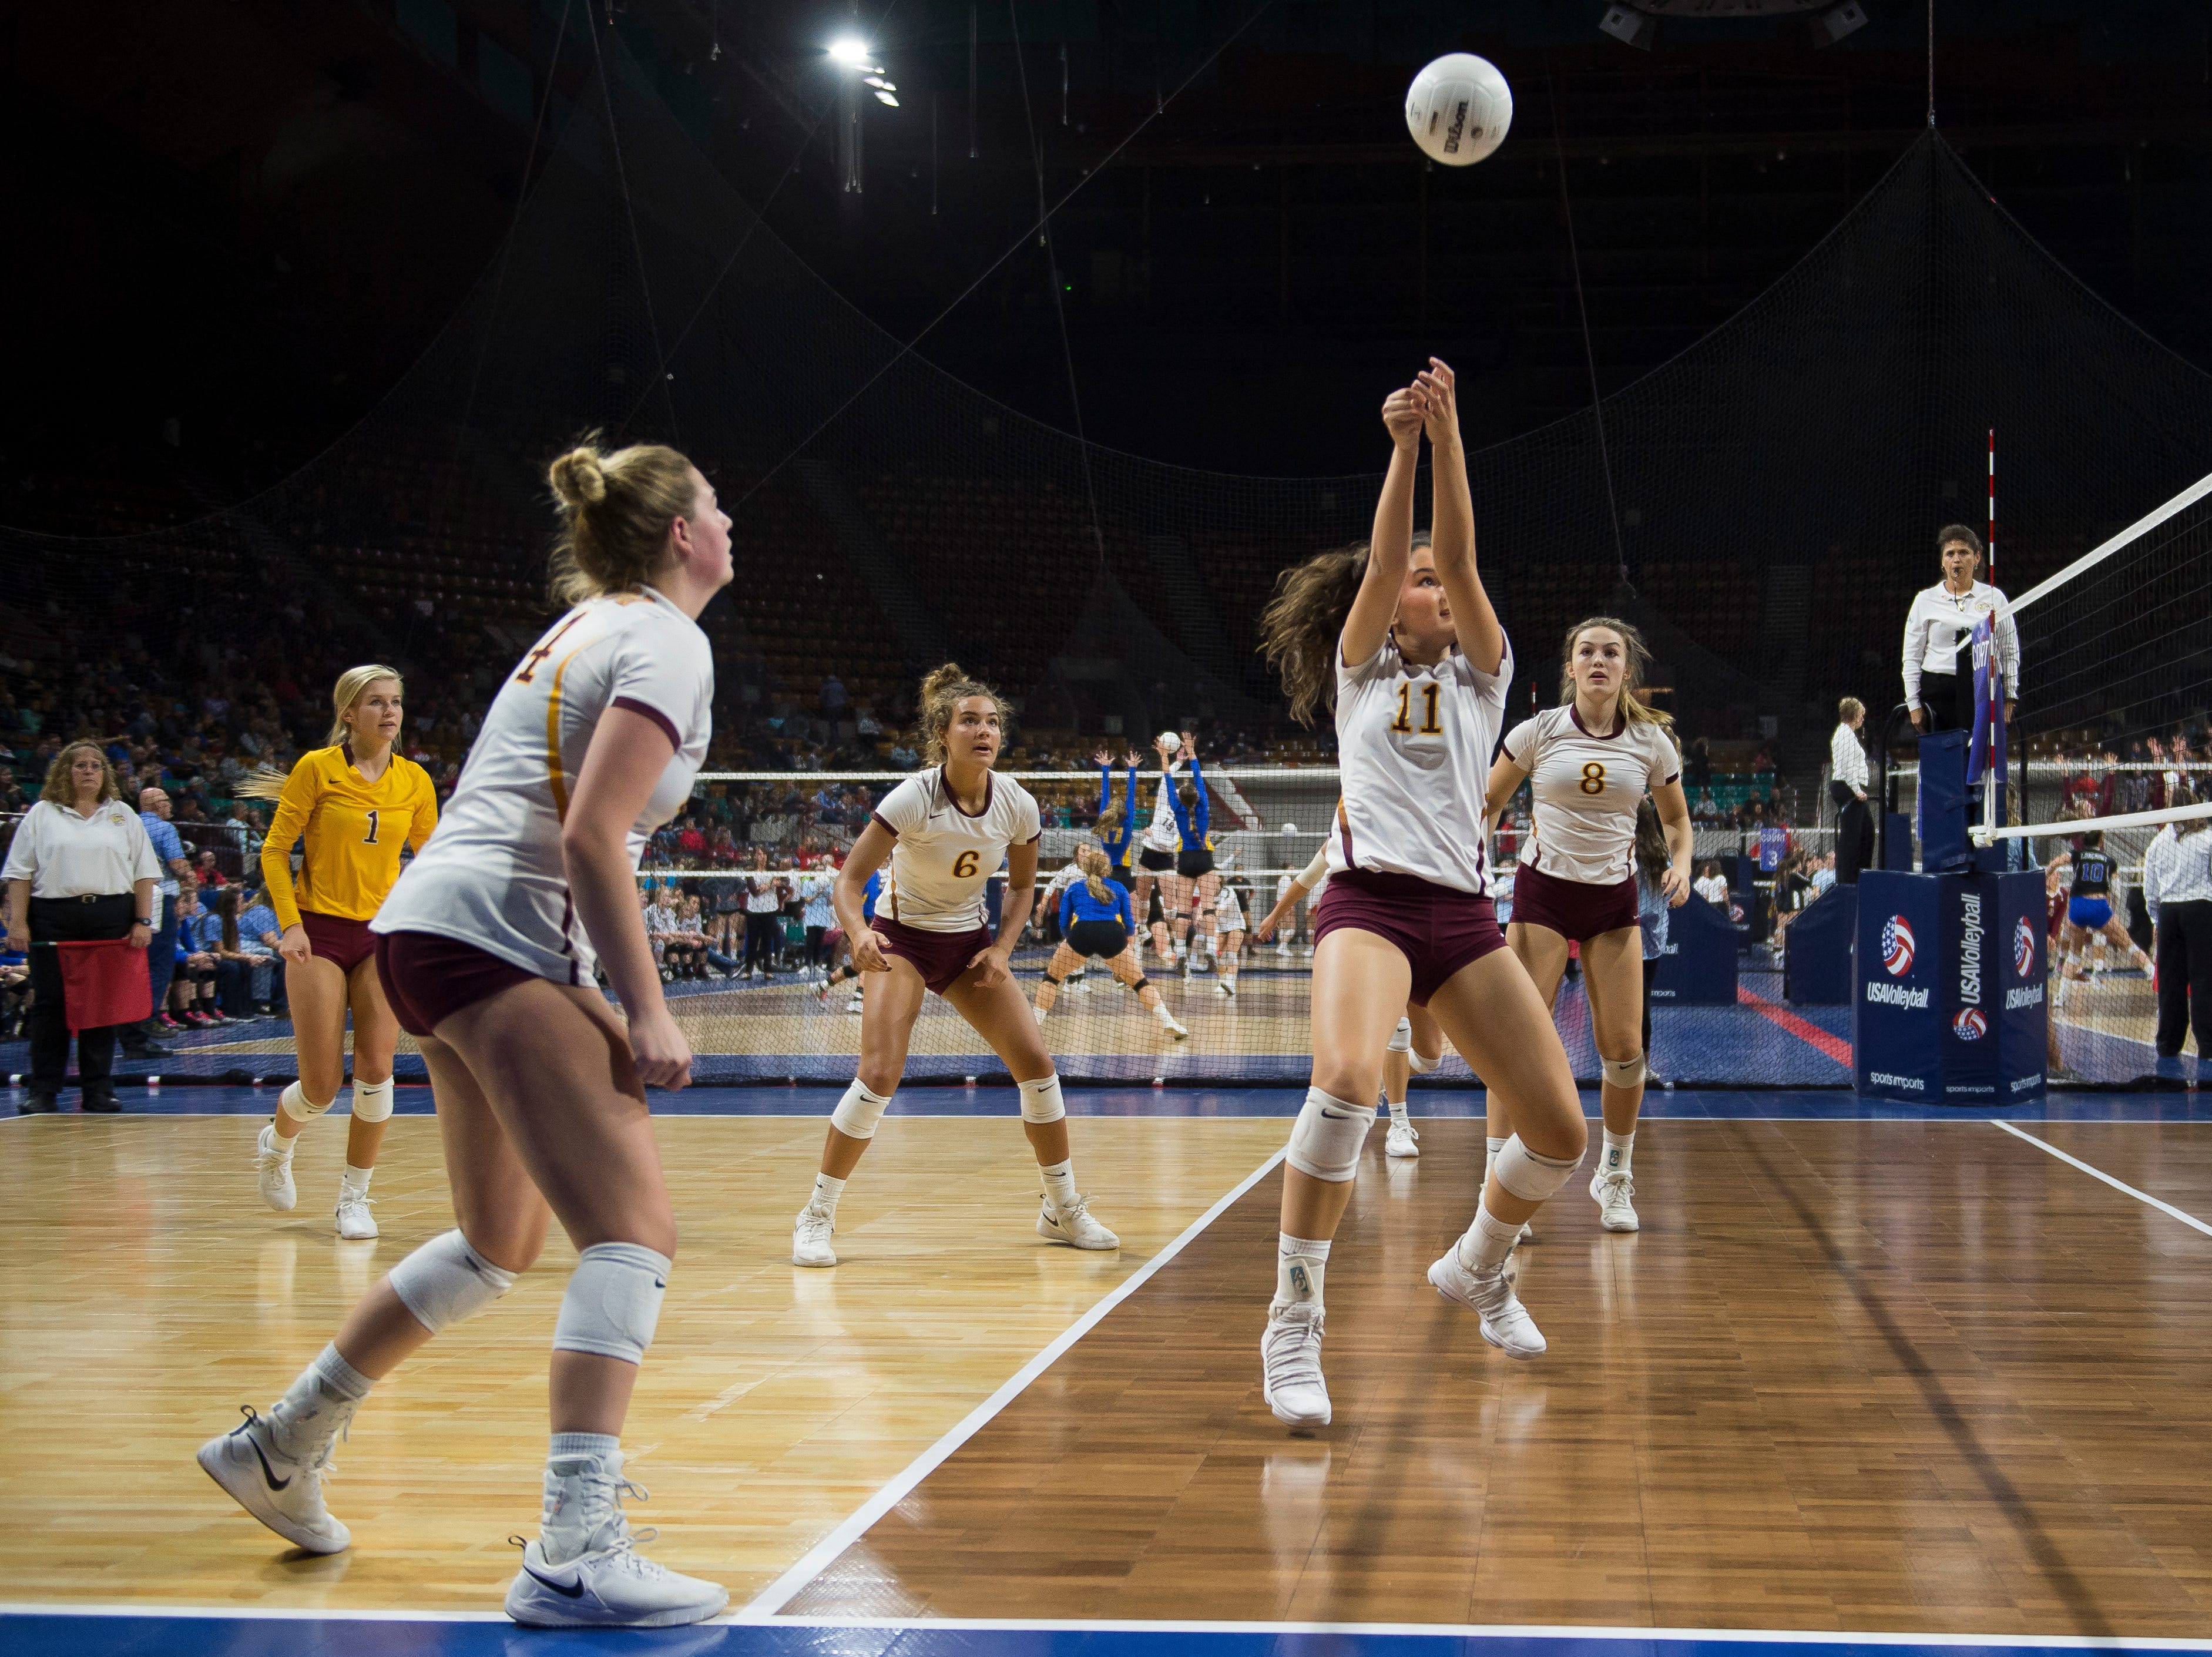 Windsor High School junior Ellie Garrett (11) sets up a teammate during a state first round game against Fossil Ridge High School on Thursday, Nov. 8, 2018, at the Denver Coliseum in Denver, Colo.